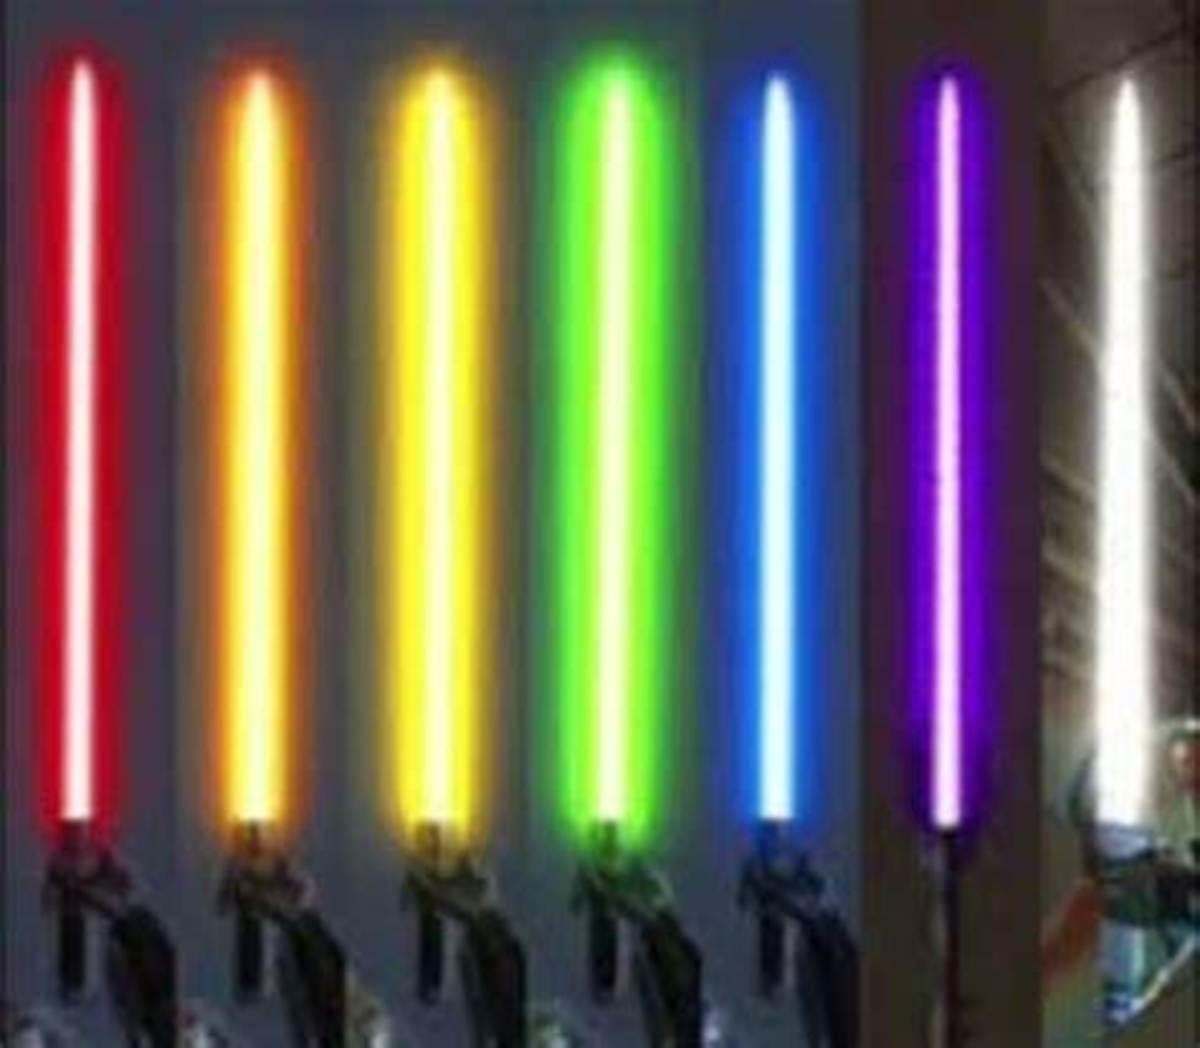 Lightsaber colors in Star Wars